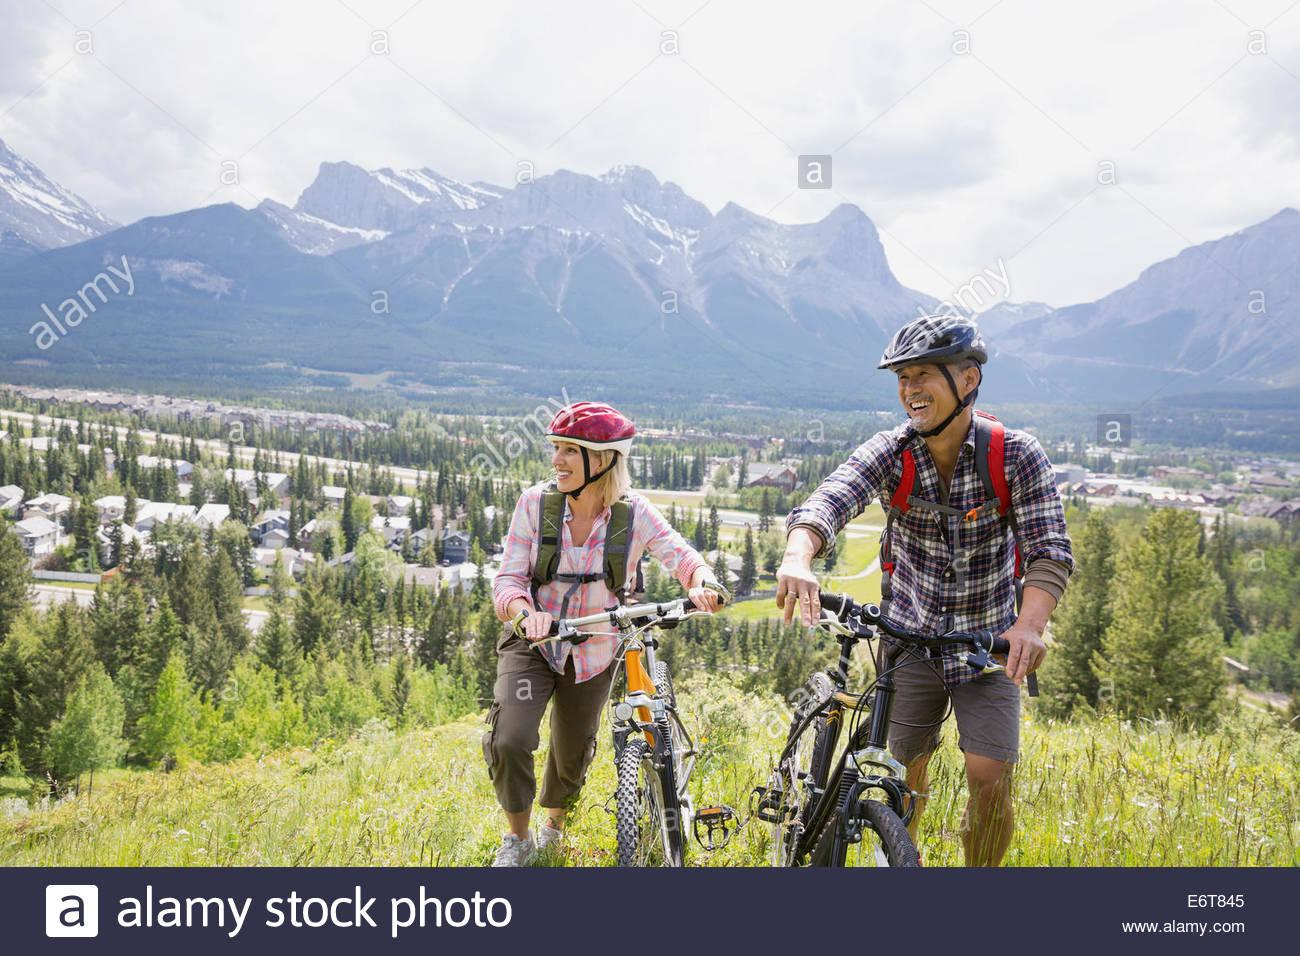 Couple walking with mountain bikes on hillside - Stock Image